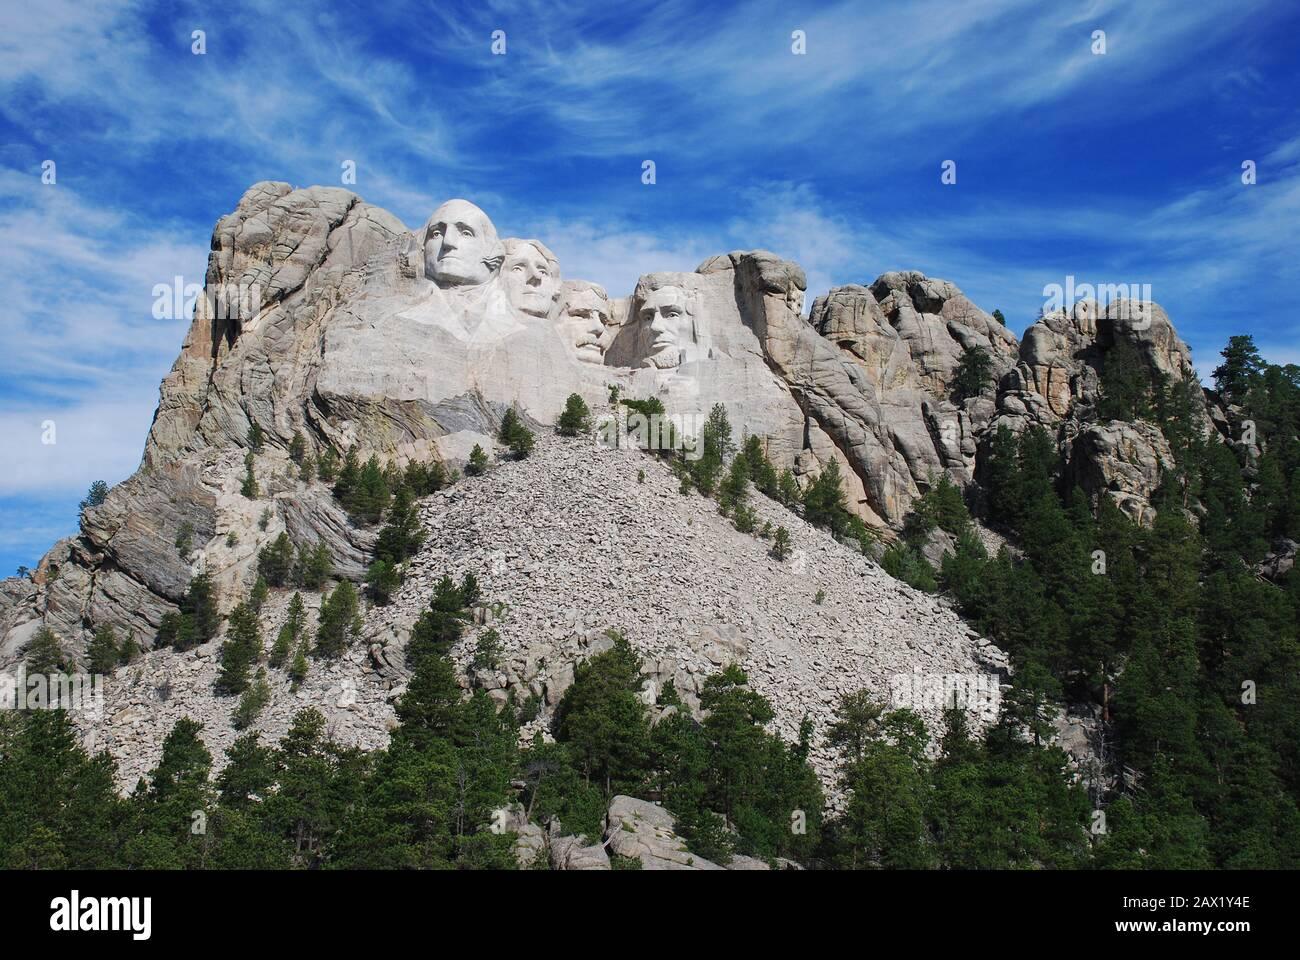 2000 ca ,  Mount Rushmore near Keystone , South Dakota , USA  : Gutzon Borglum 's sculpture of Mount  Rushmore Memorial -- George Washington, Thomas Jefferson, Roosevelt  & Lincoln . The U.S.A. President ABRAHAM LINCOLN (  1809 - 1865 ).  The Mount Rushmore National Memorial is a sculpture carved into the granite face of Mount Rushmore near Keystone, South Dakota, in the United States. Sculpted by Danish-American Gutzon Borglum and his son , Lincoln Borglum , Mount Rushmore features 60-foot ( 18 m ) sculptures of the heads of four United States presidents . Photo by Carol M. Highsmith - Stati Stock Photo